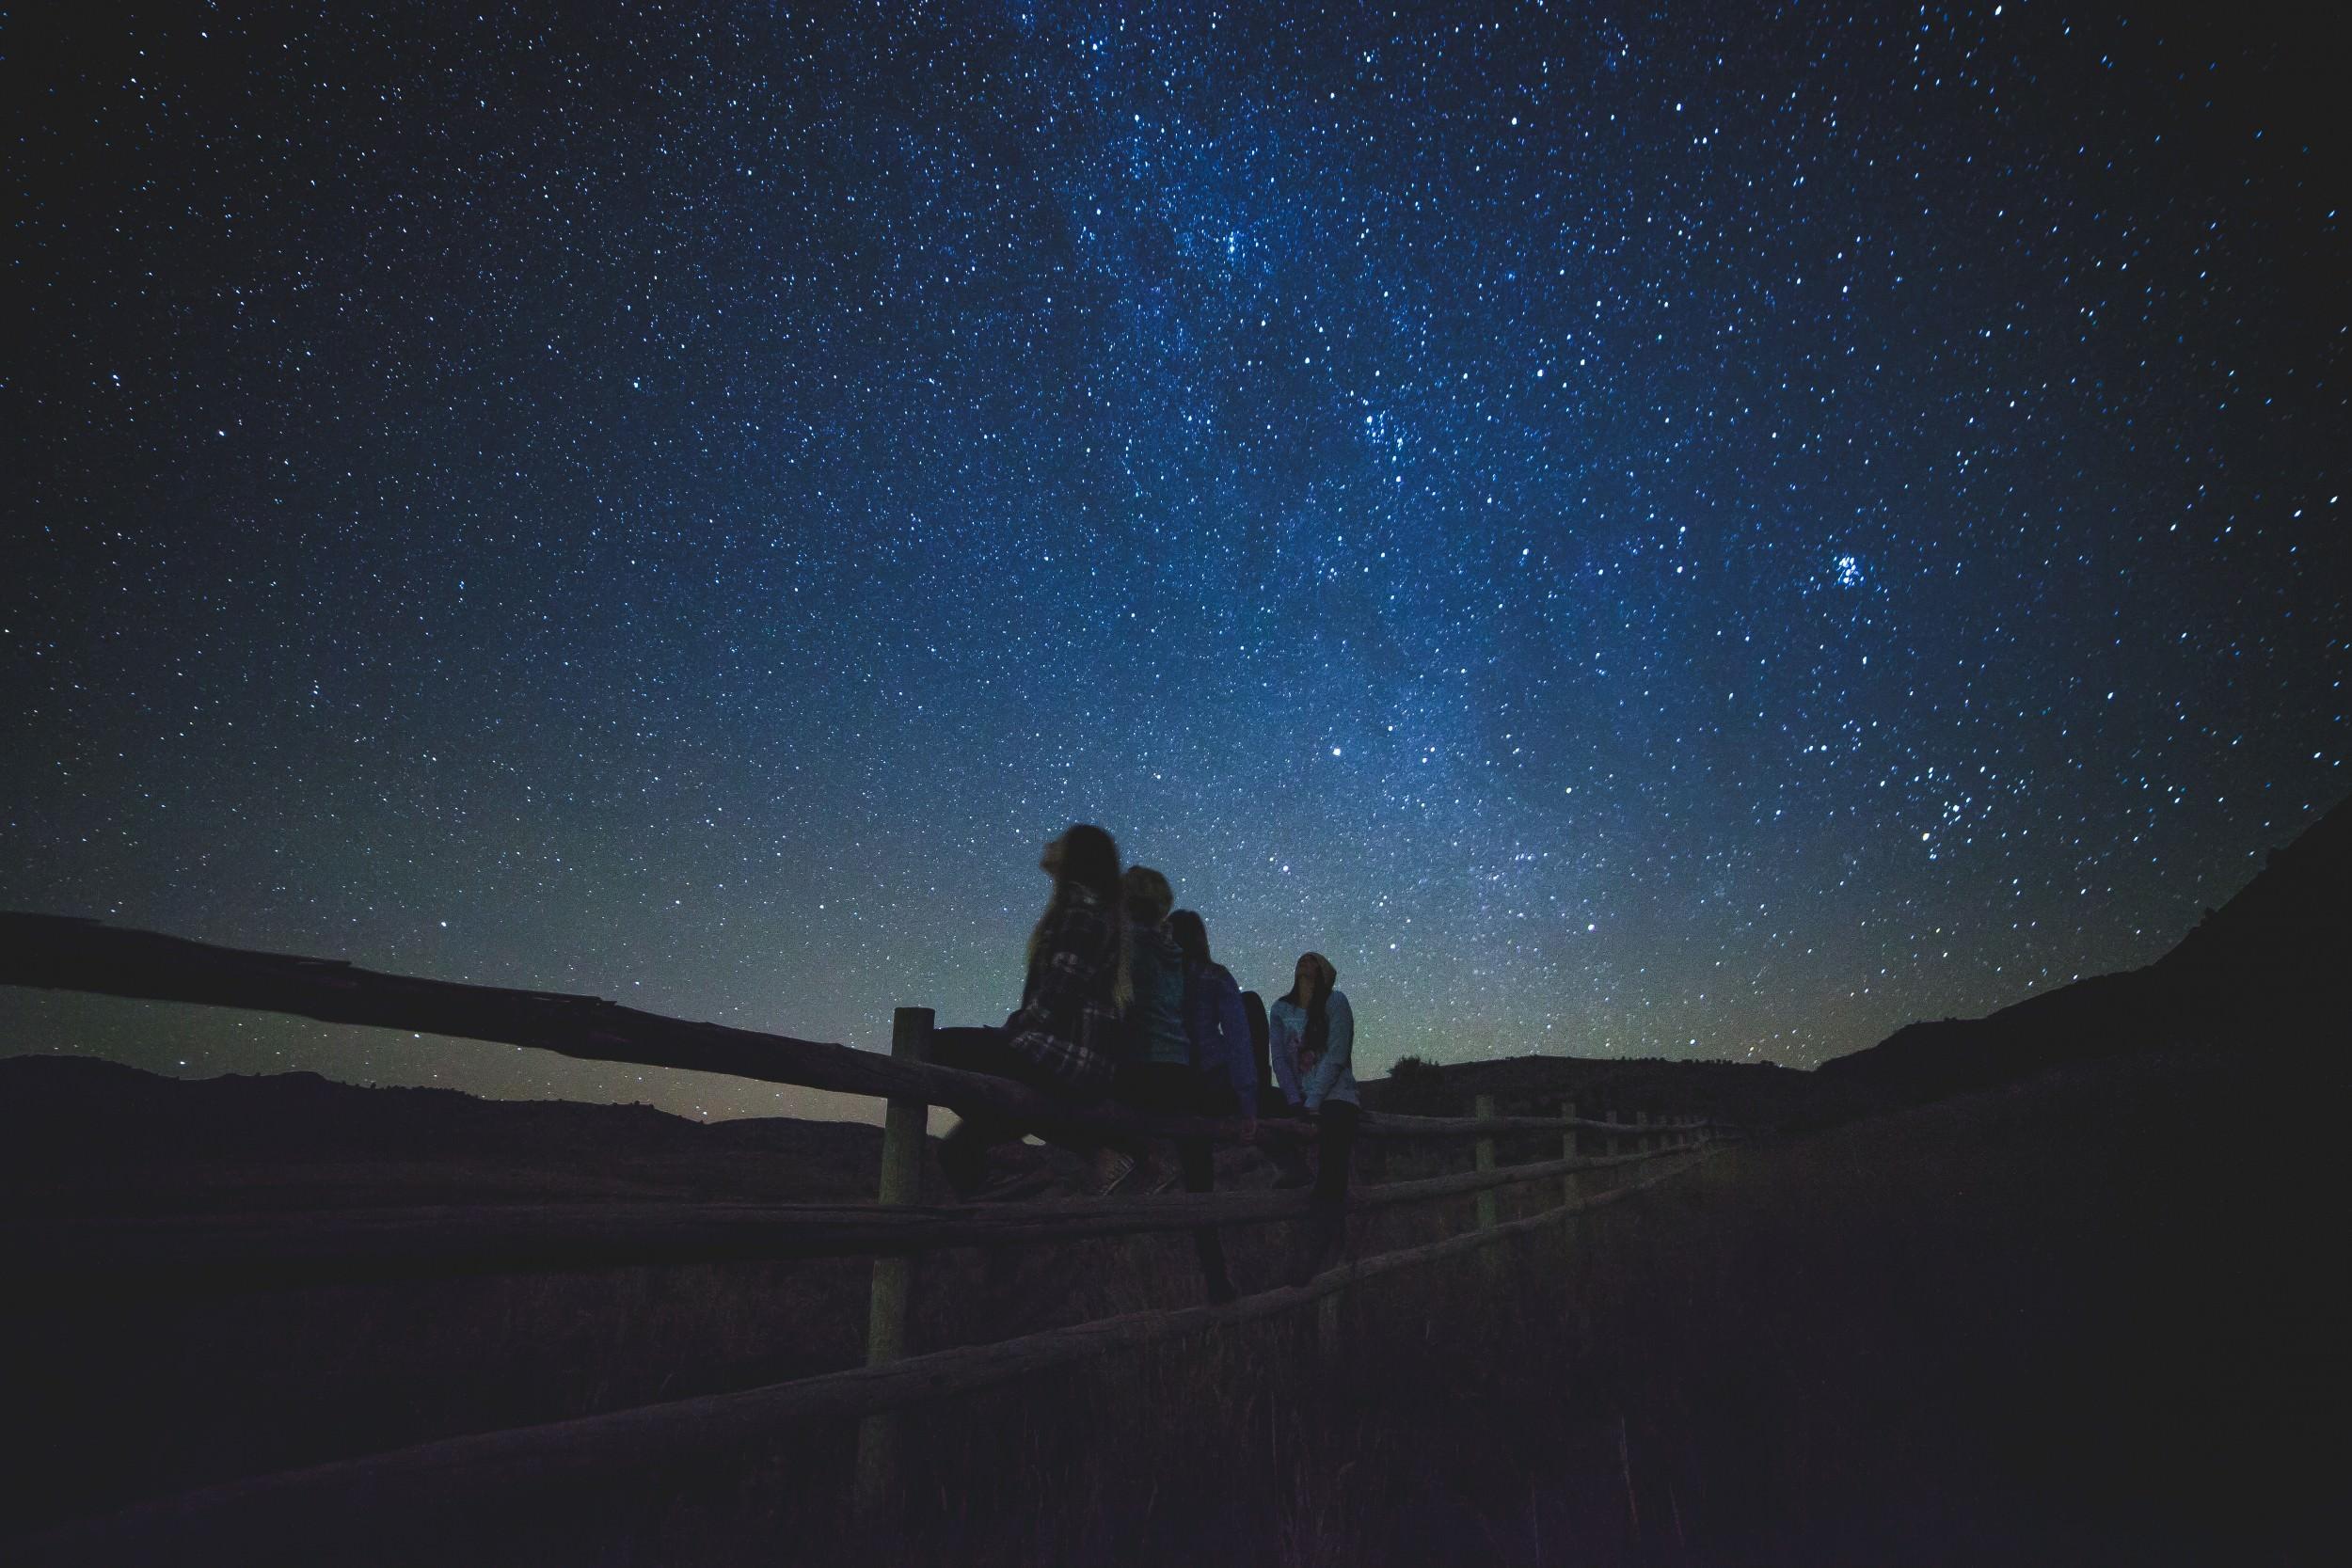 night sky with people. unsplash